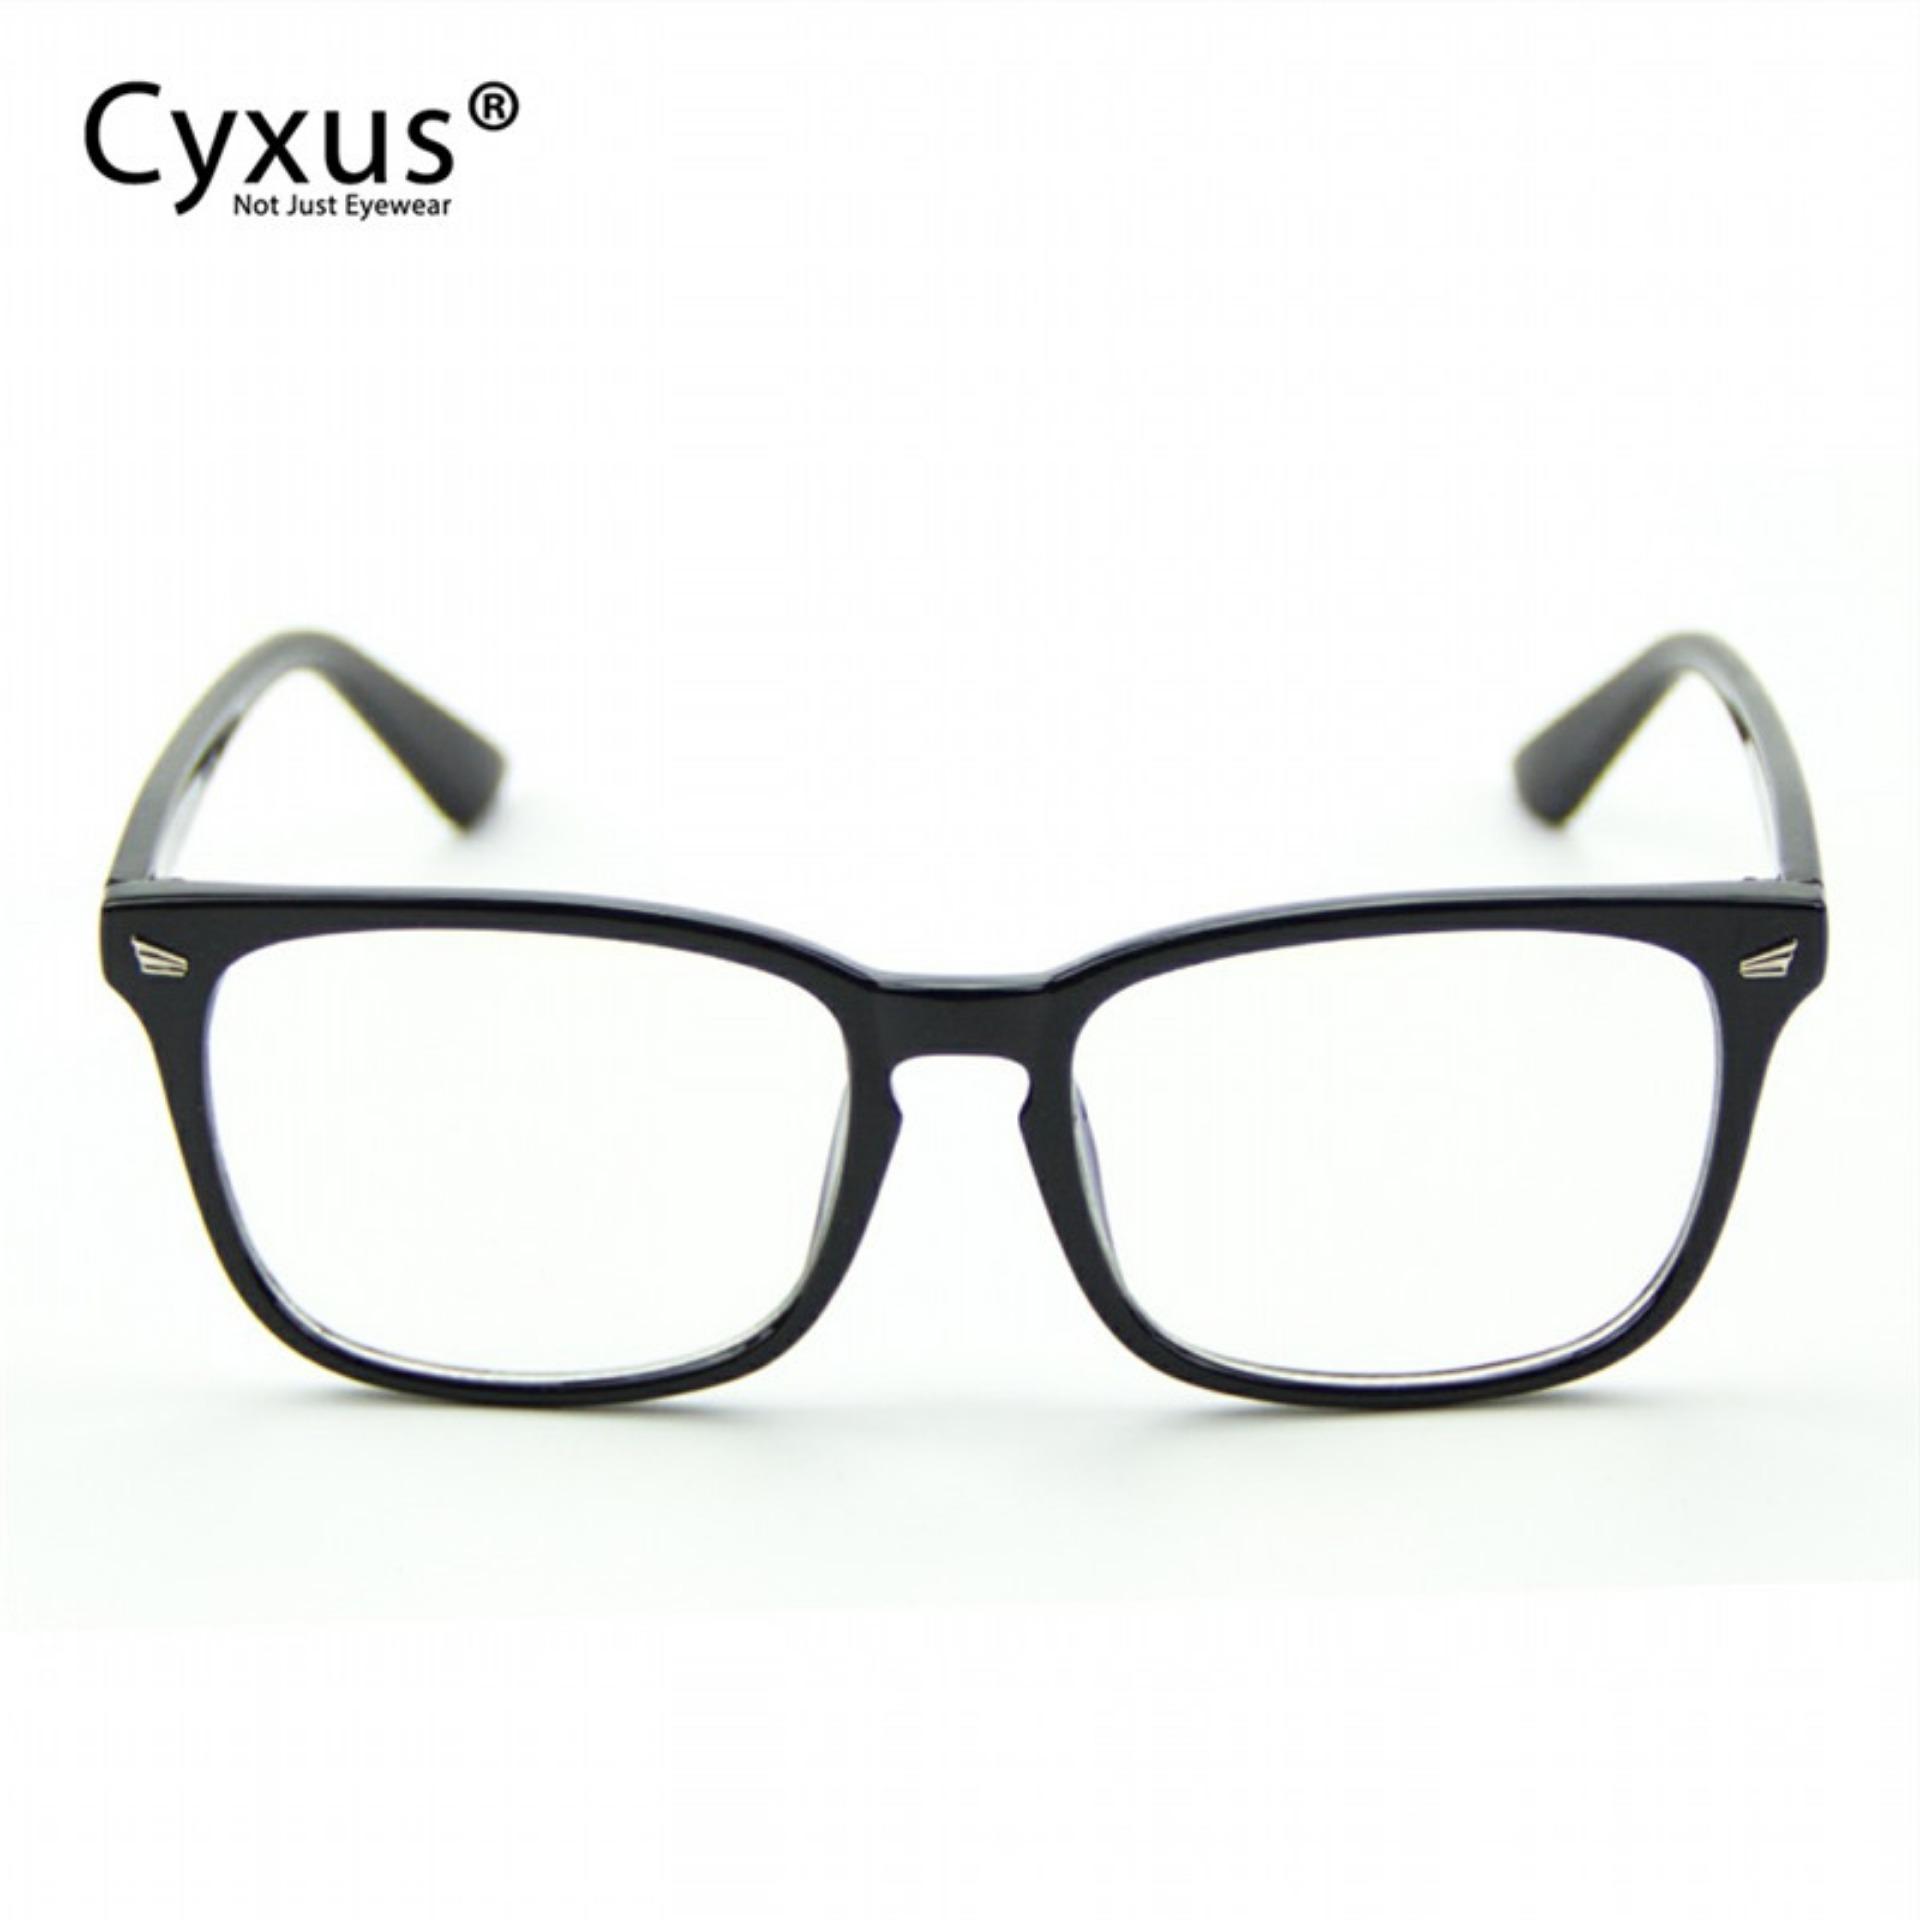 18c2cc7d2ef9 Cyxus Classic Black Frame Optical Glasses Men Women Eyewear